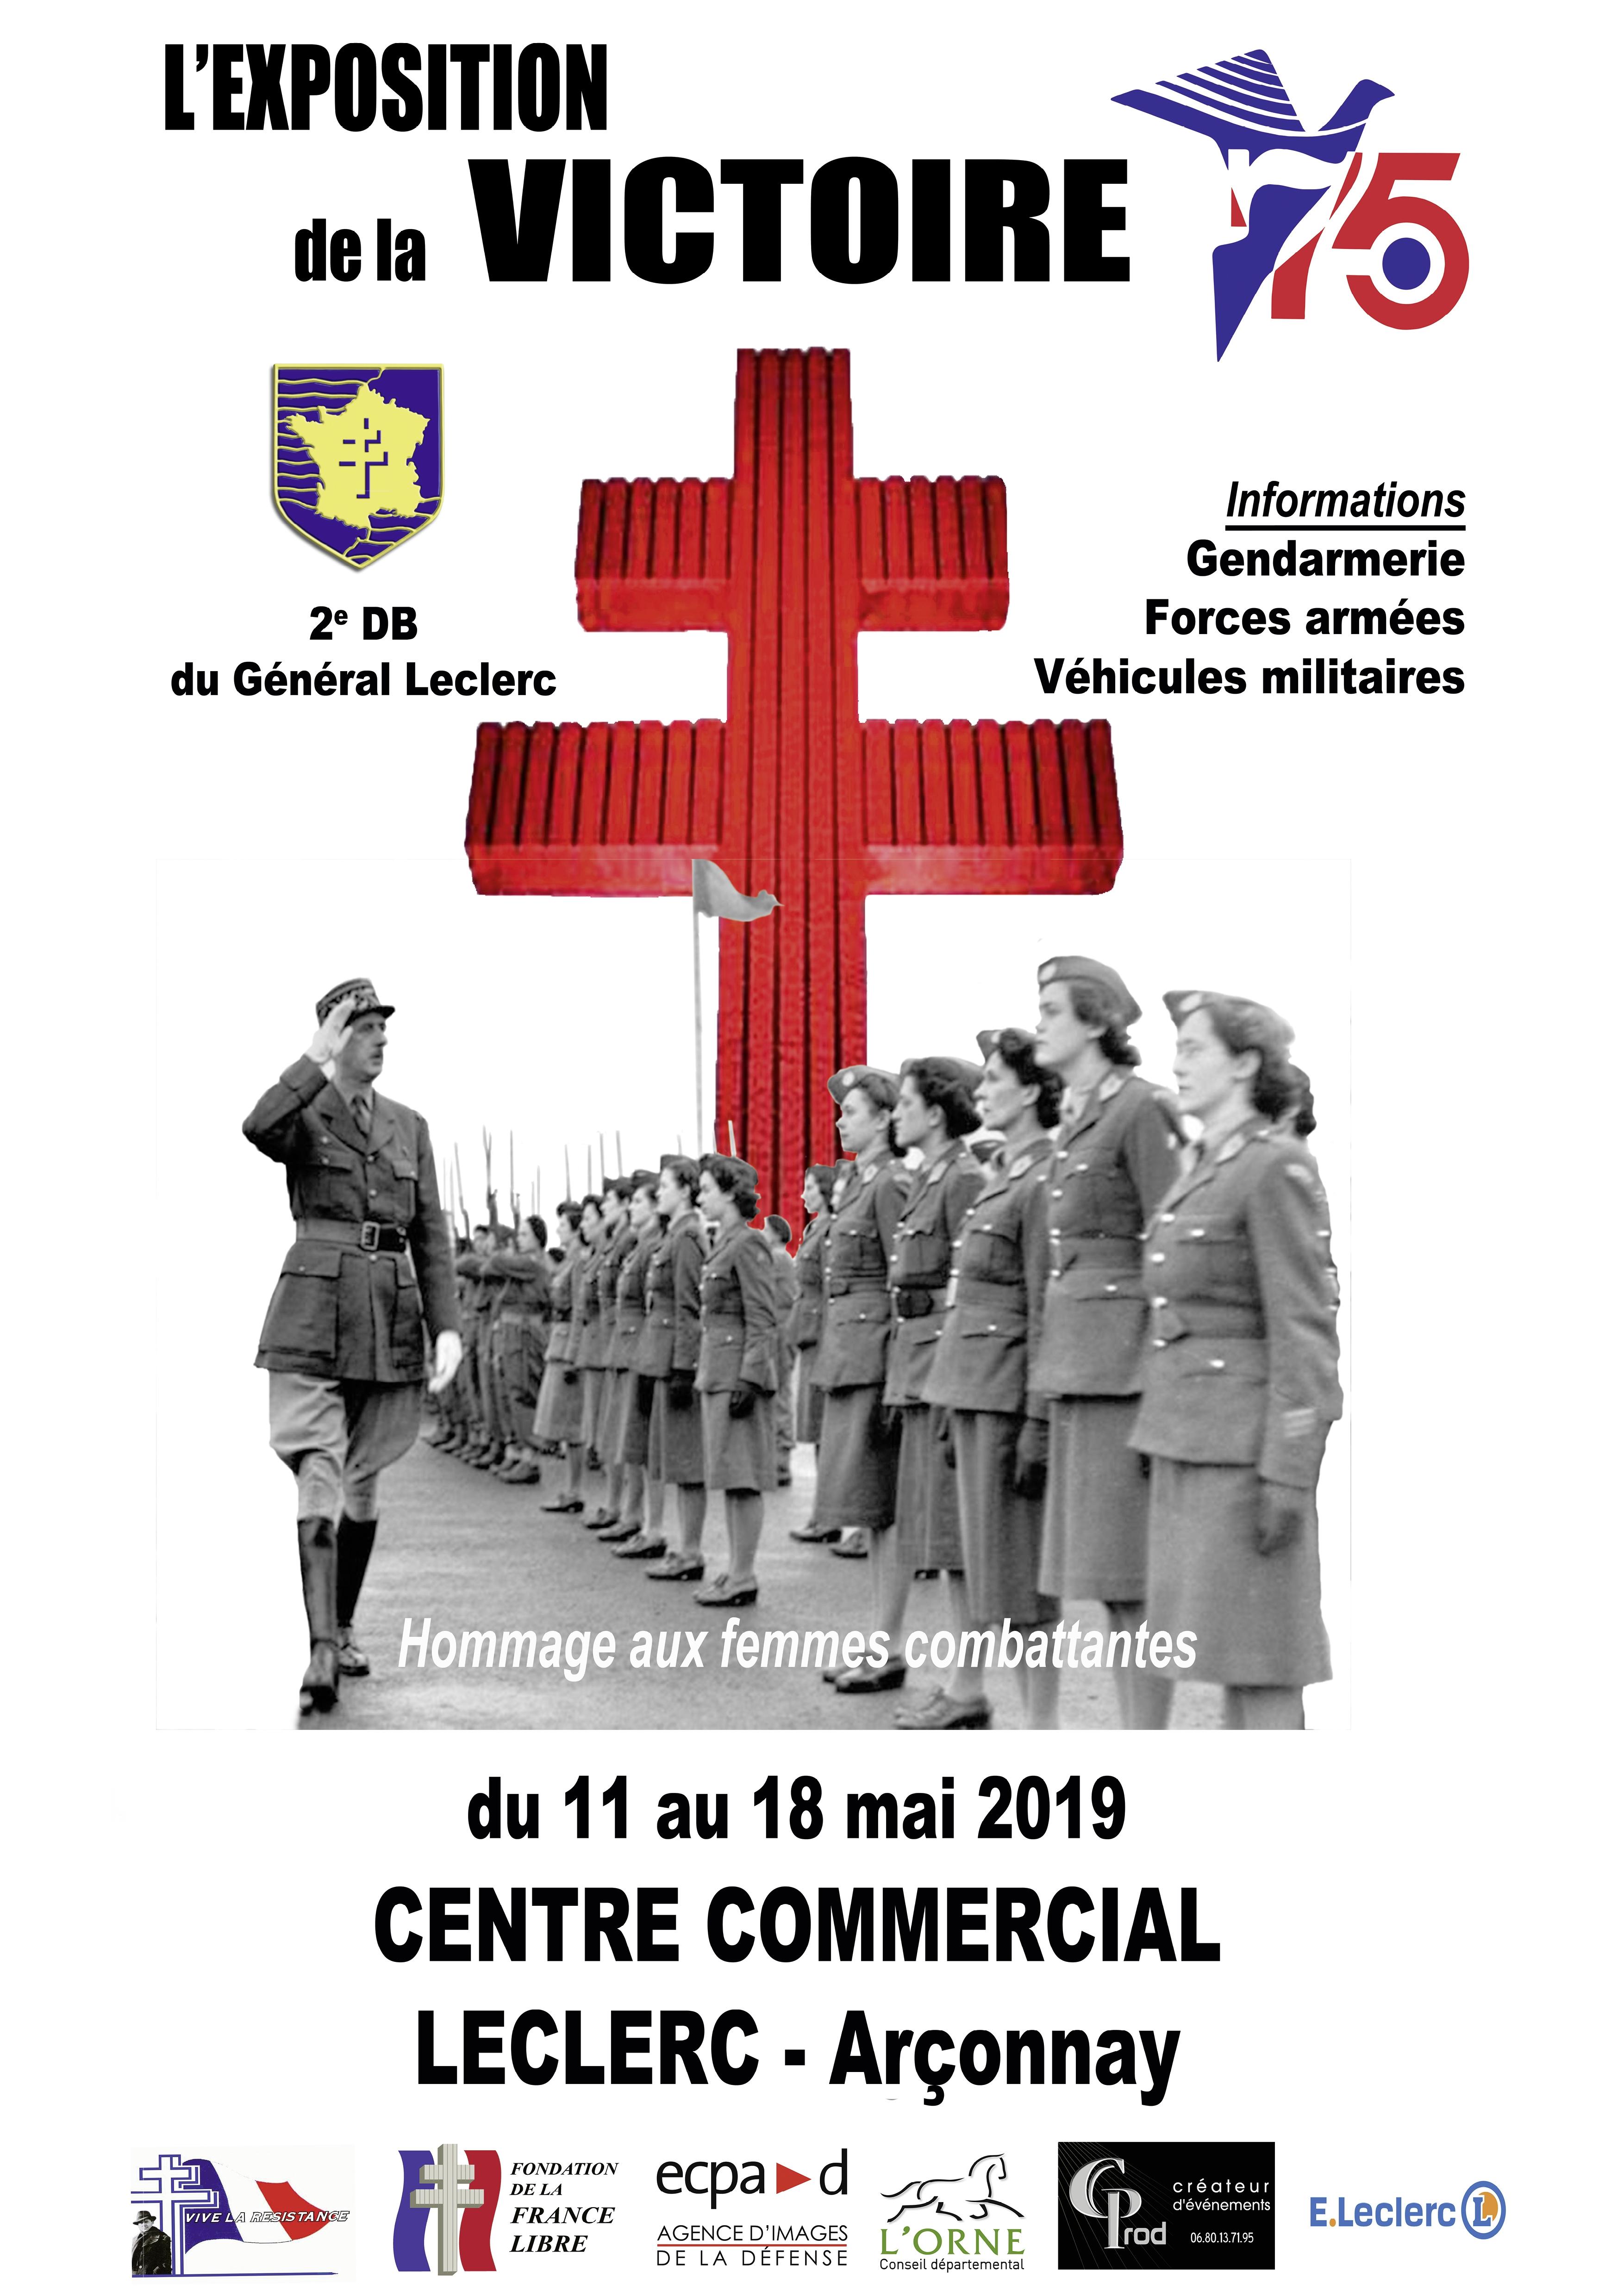 AFF-A3-Expo-Femme 2e guerre 2019